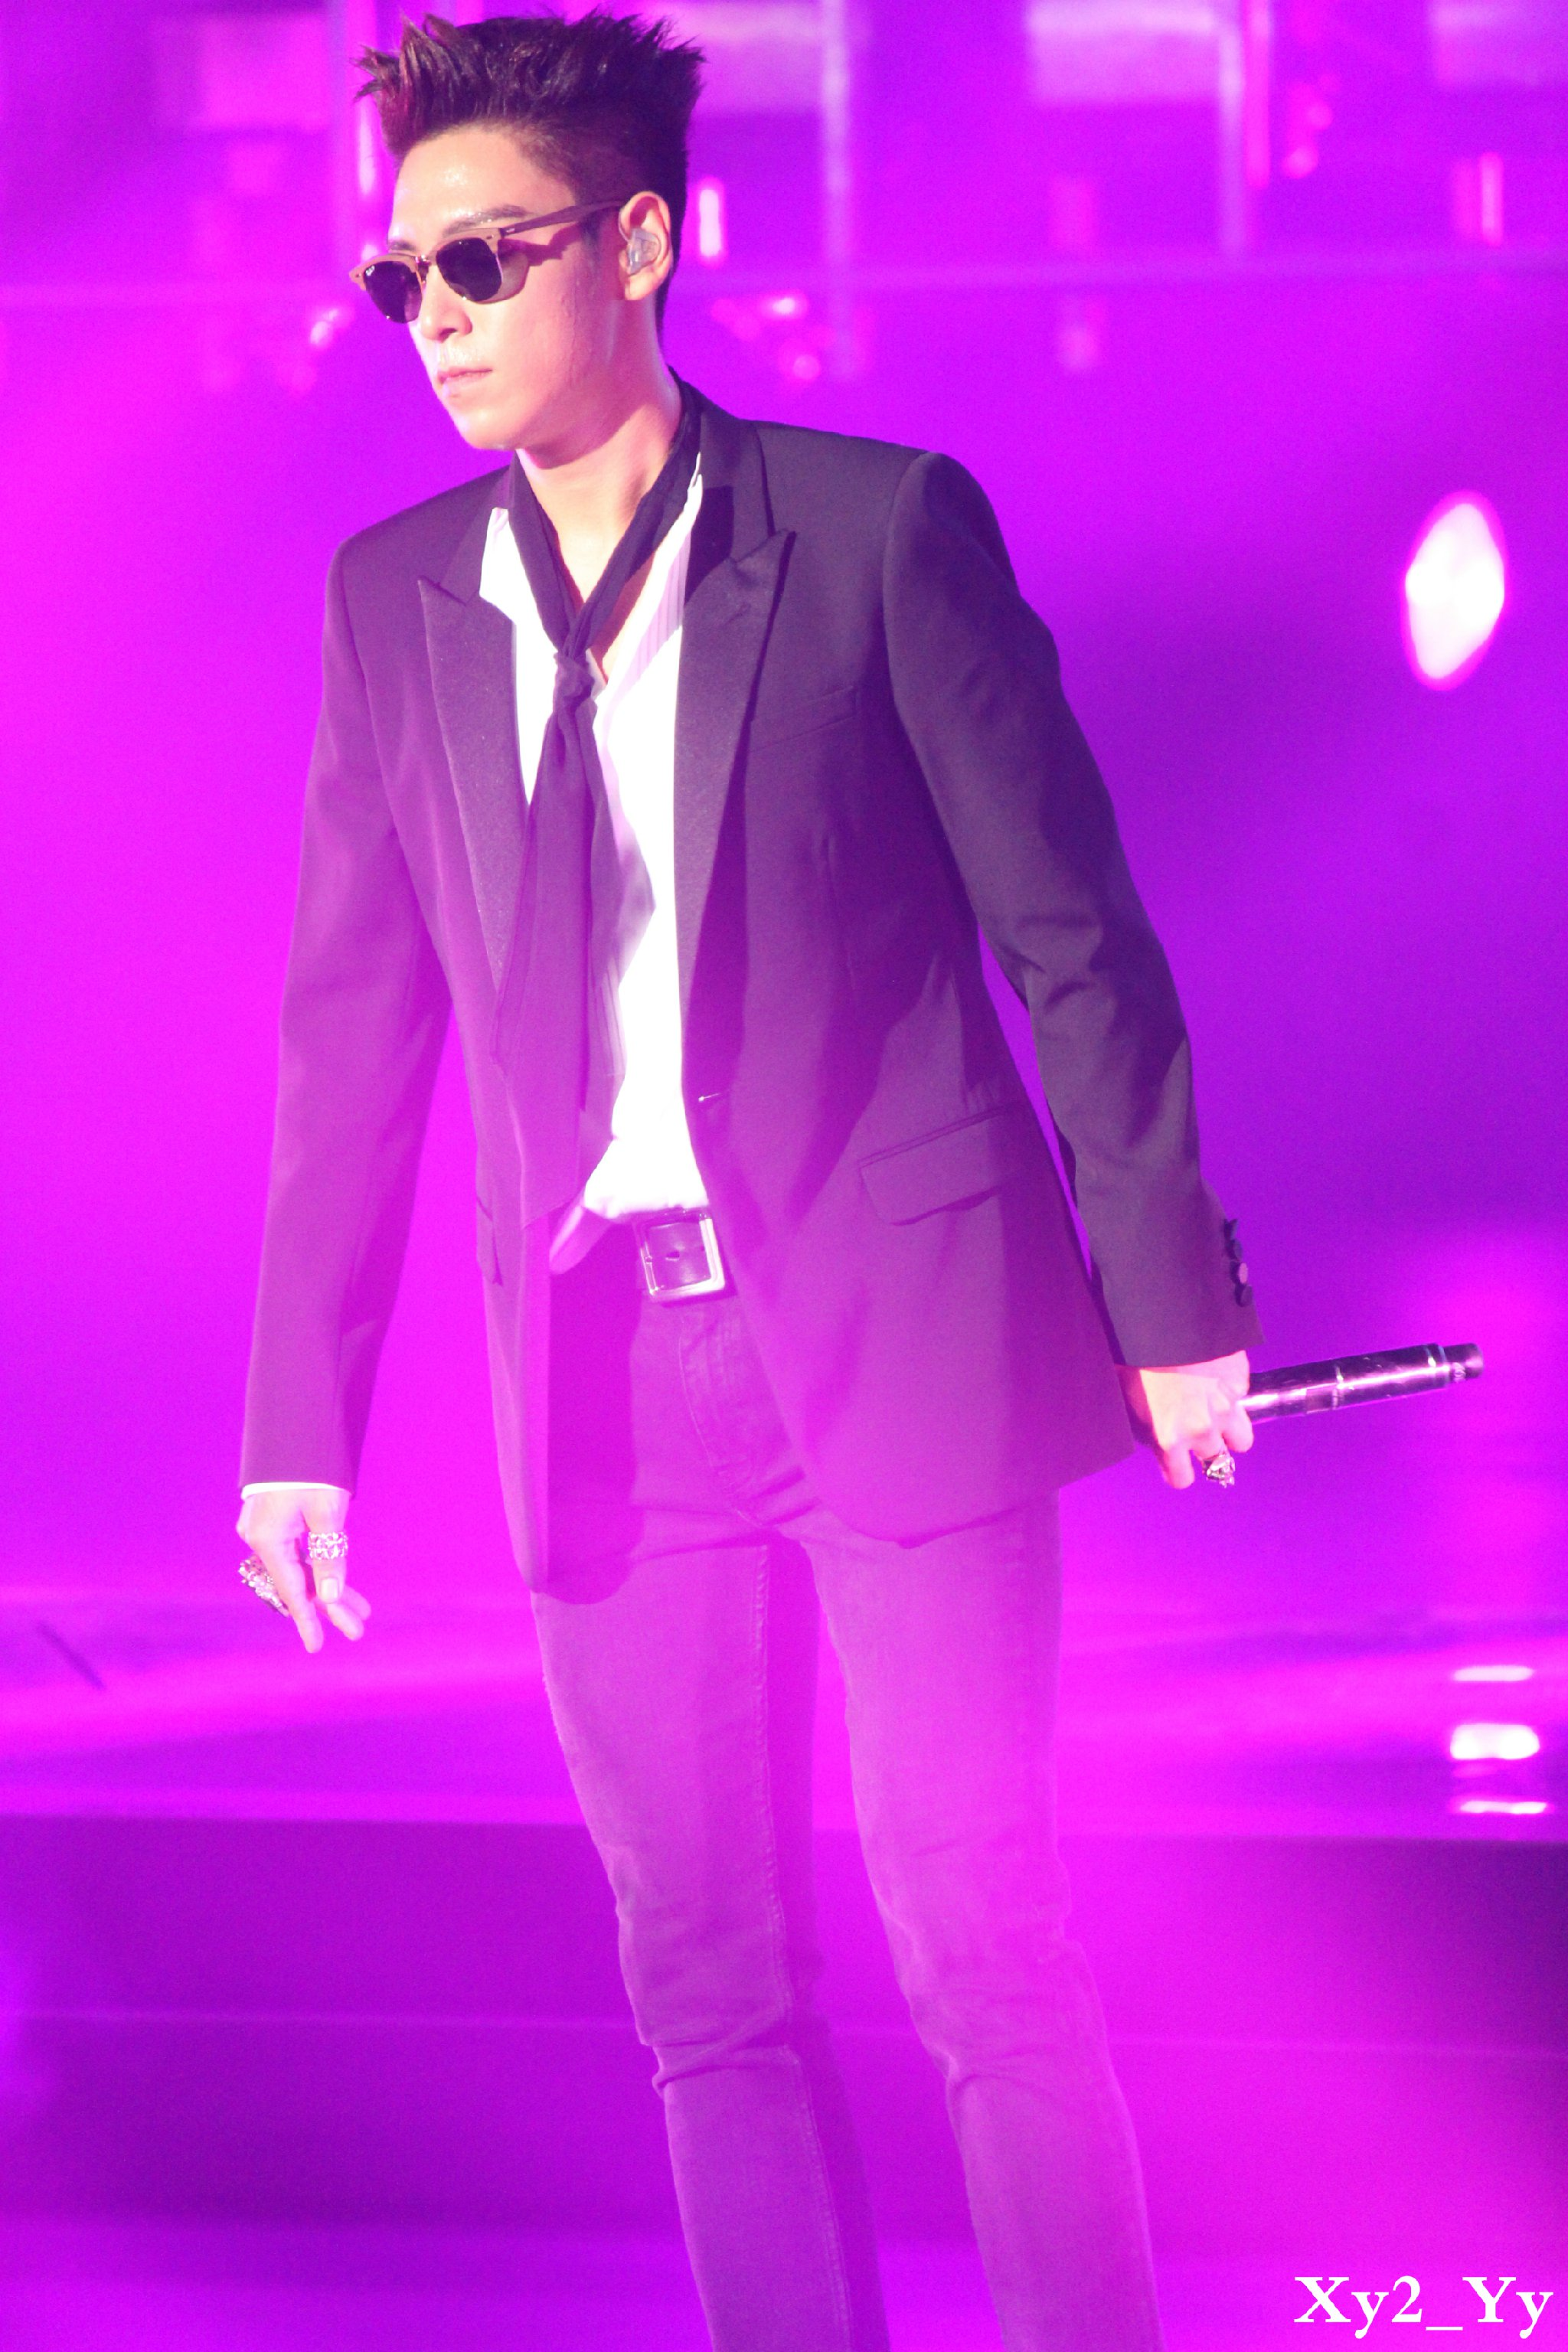 BIGBANG - Made Tour 2015 - Beijing - 05jun2015 - Xy2_Yy - 12.jpg